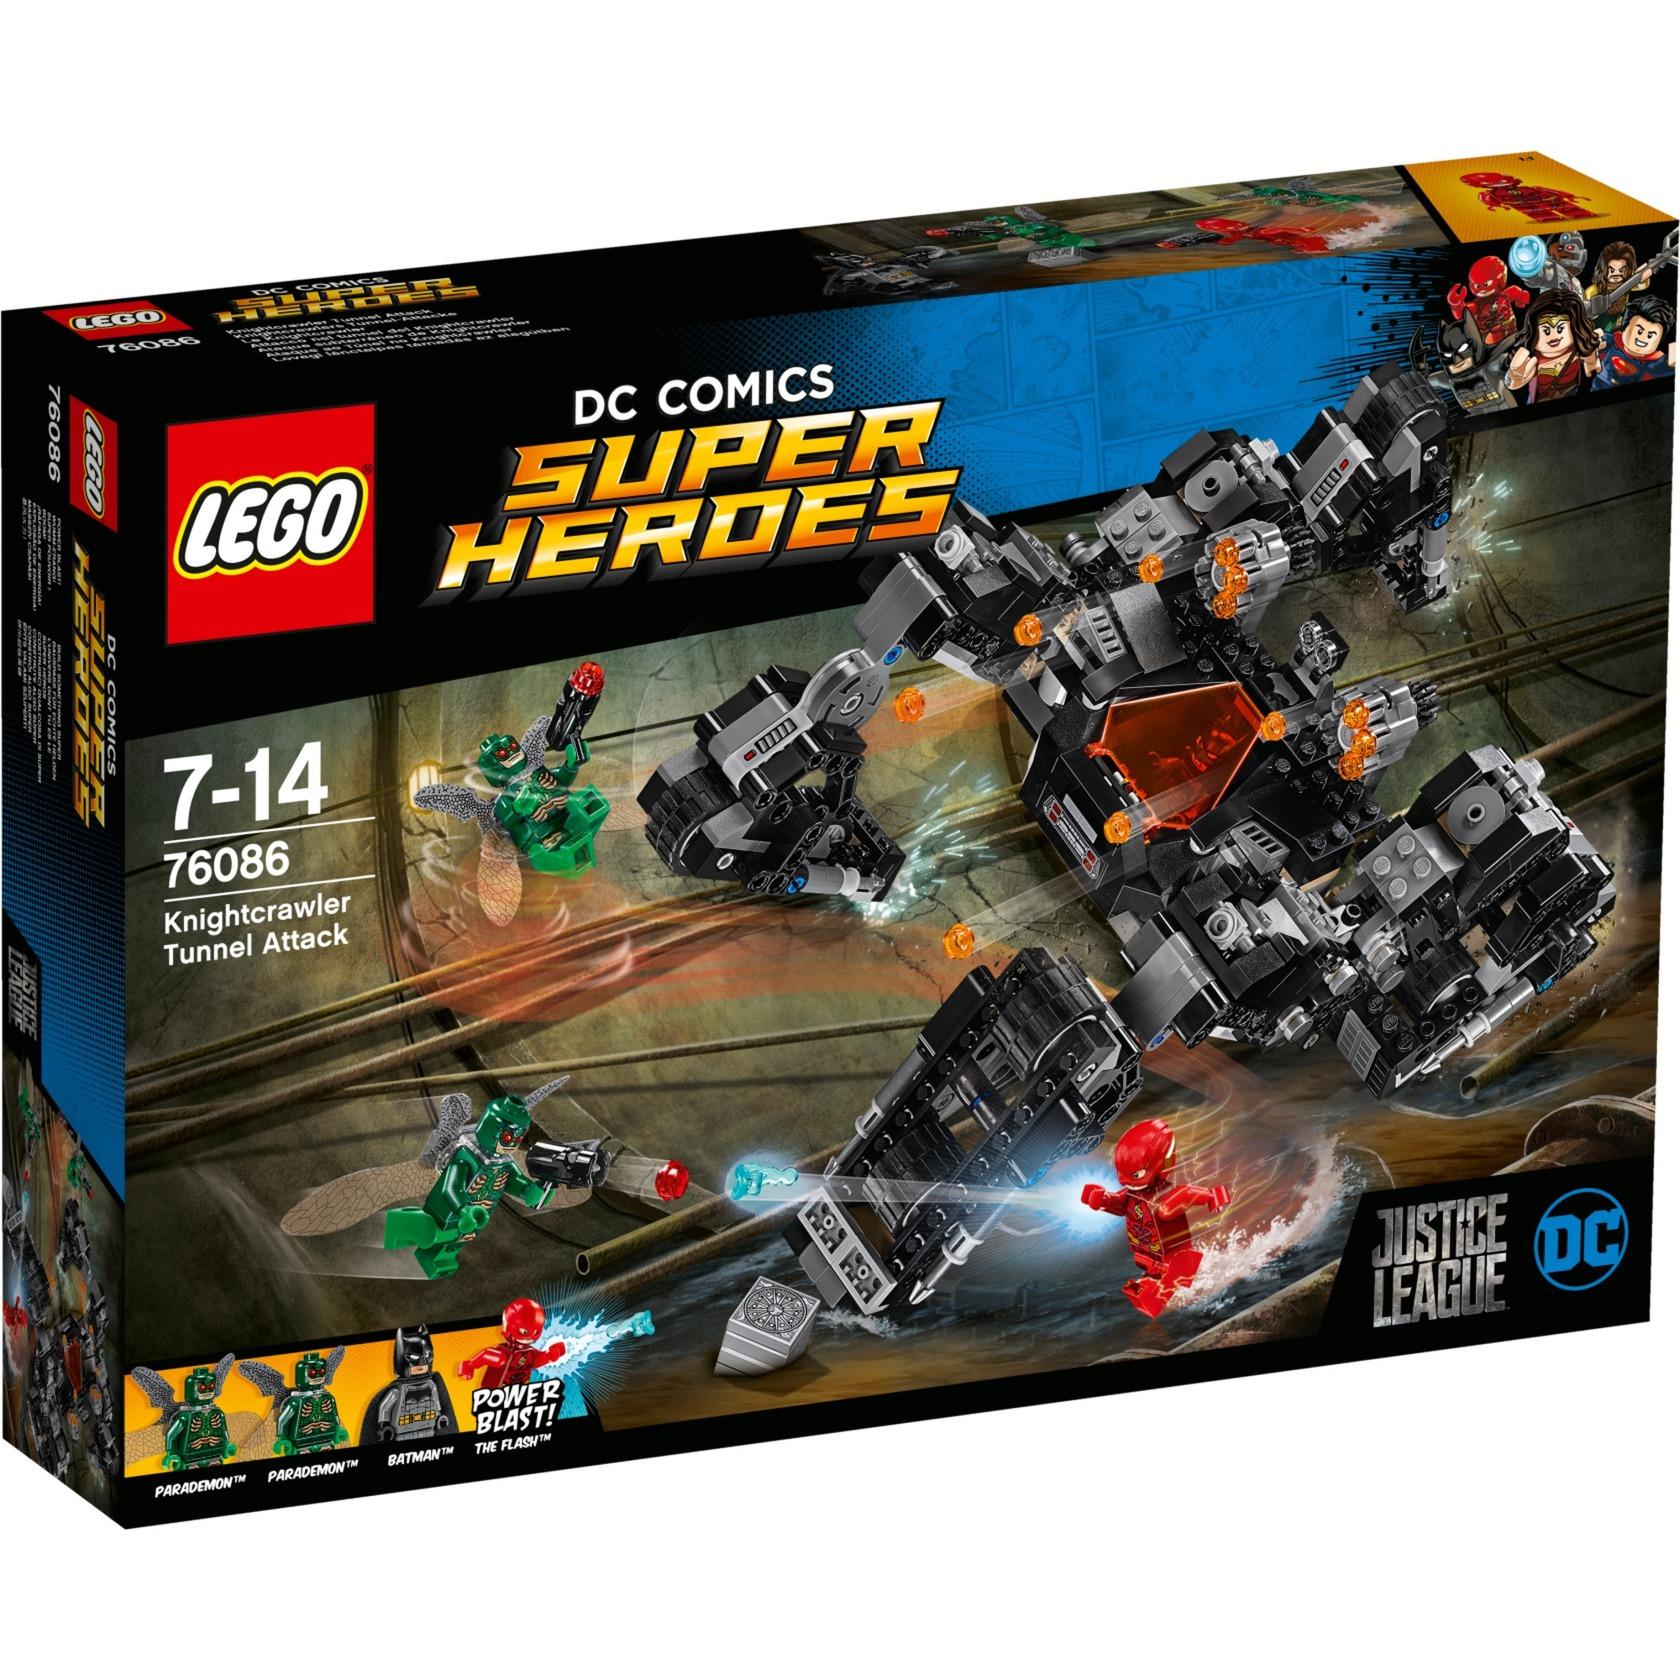 Lego Super Le Construction76086 KnightcrawlerJouets De Heroes Comics Dc htCsQdr